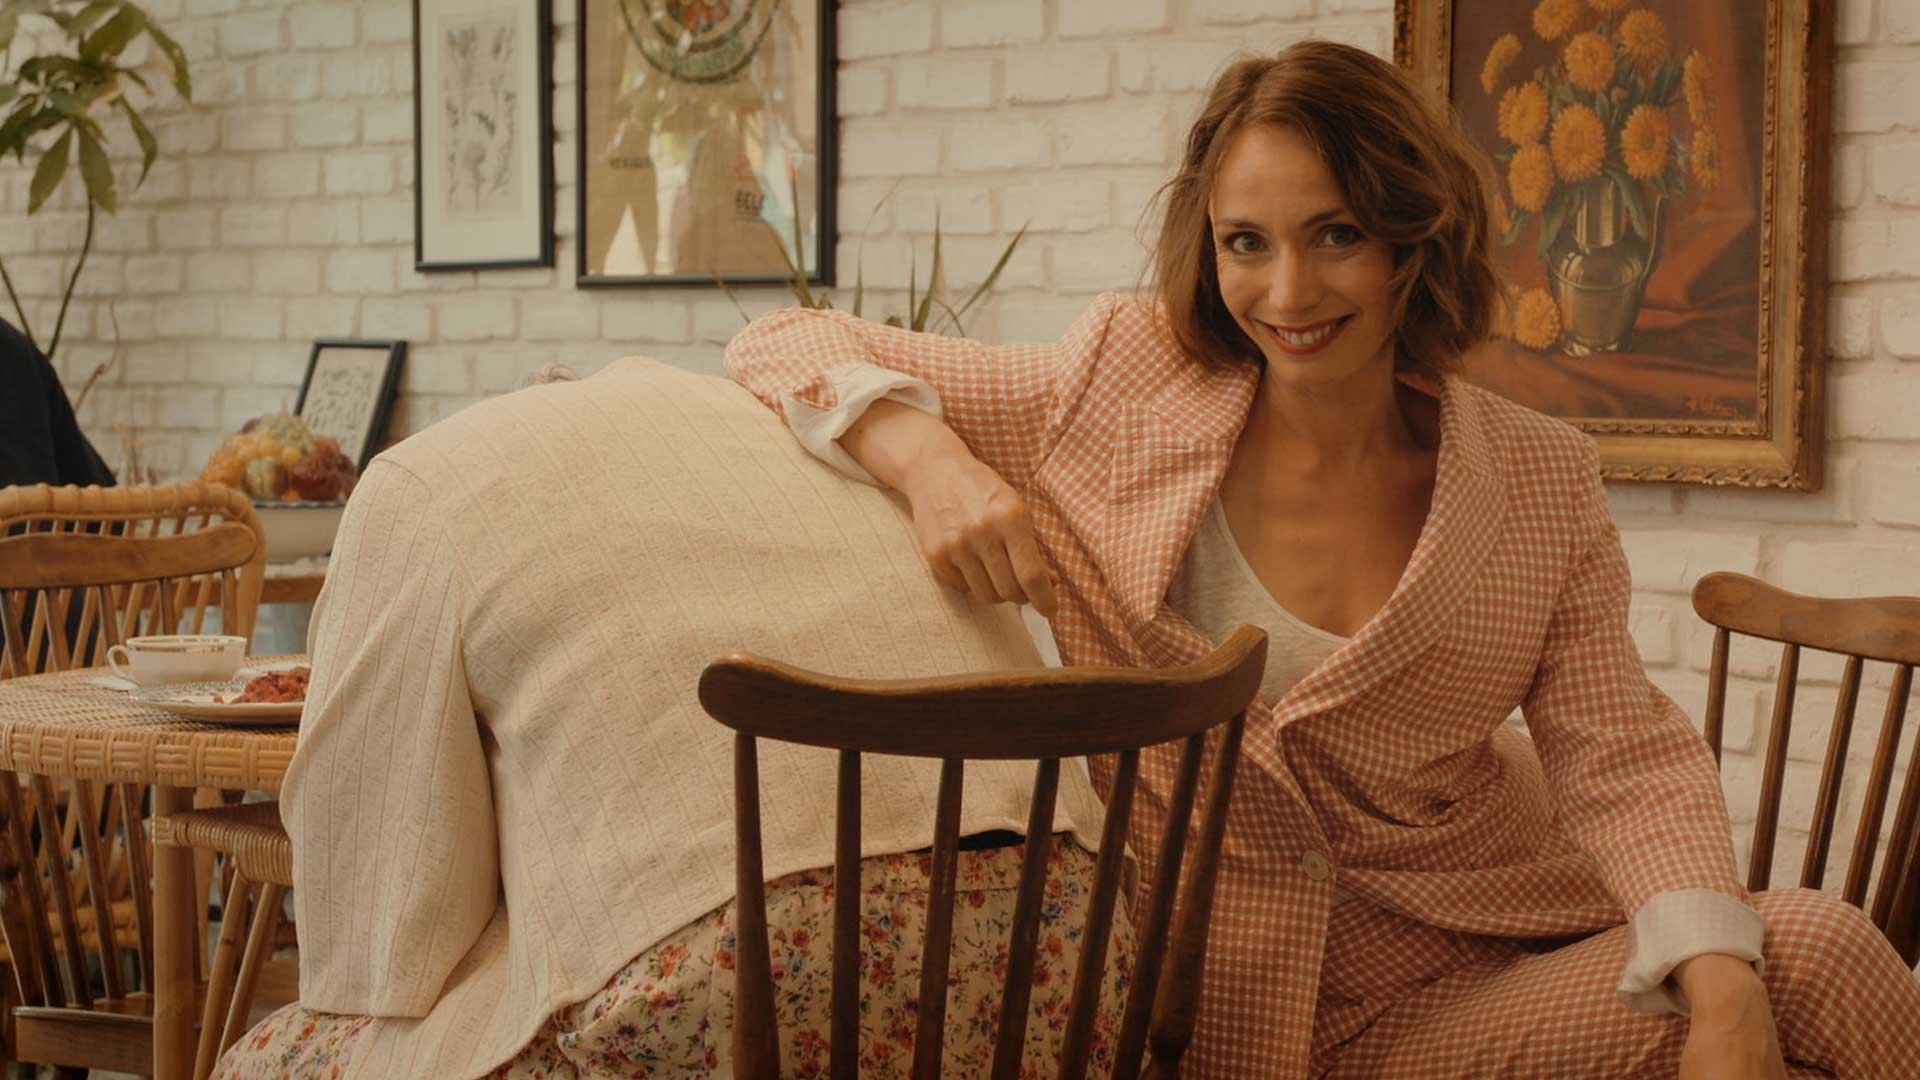 salon de thé femme costume rose grand-mère